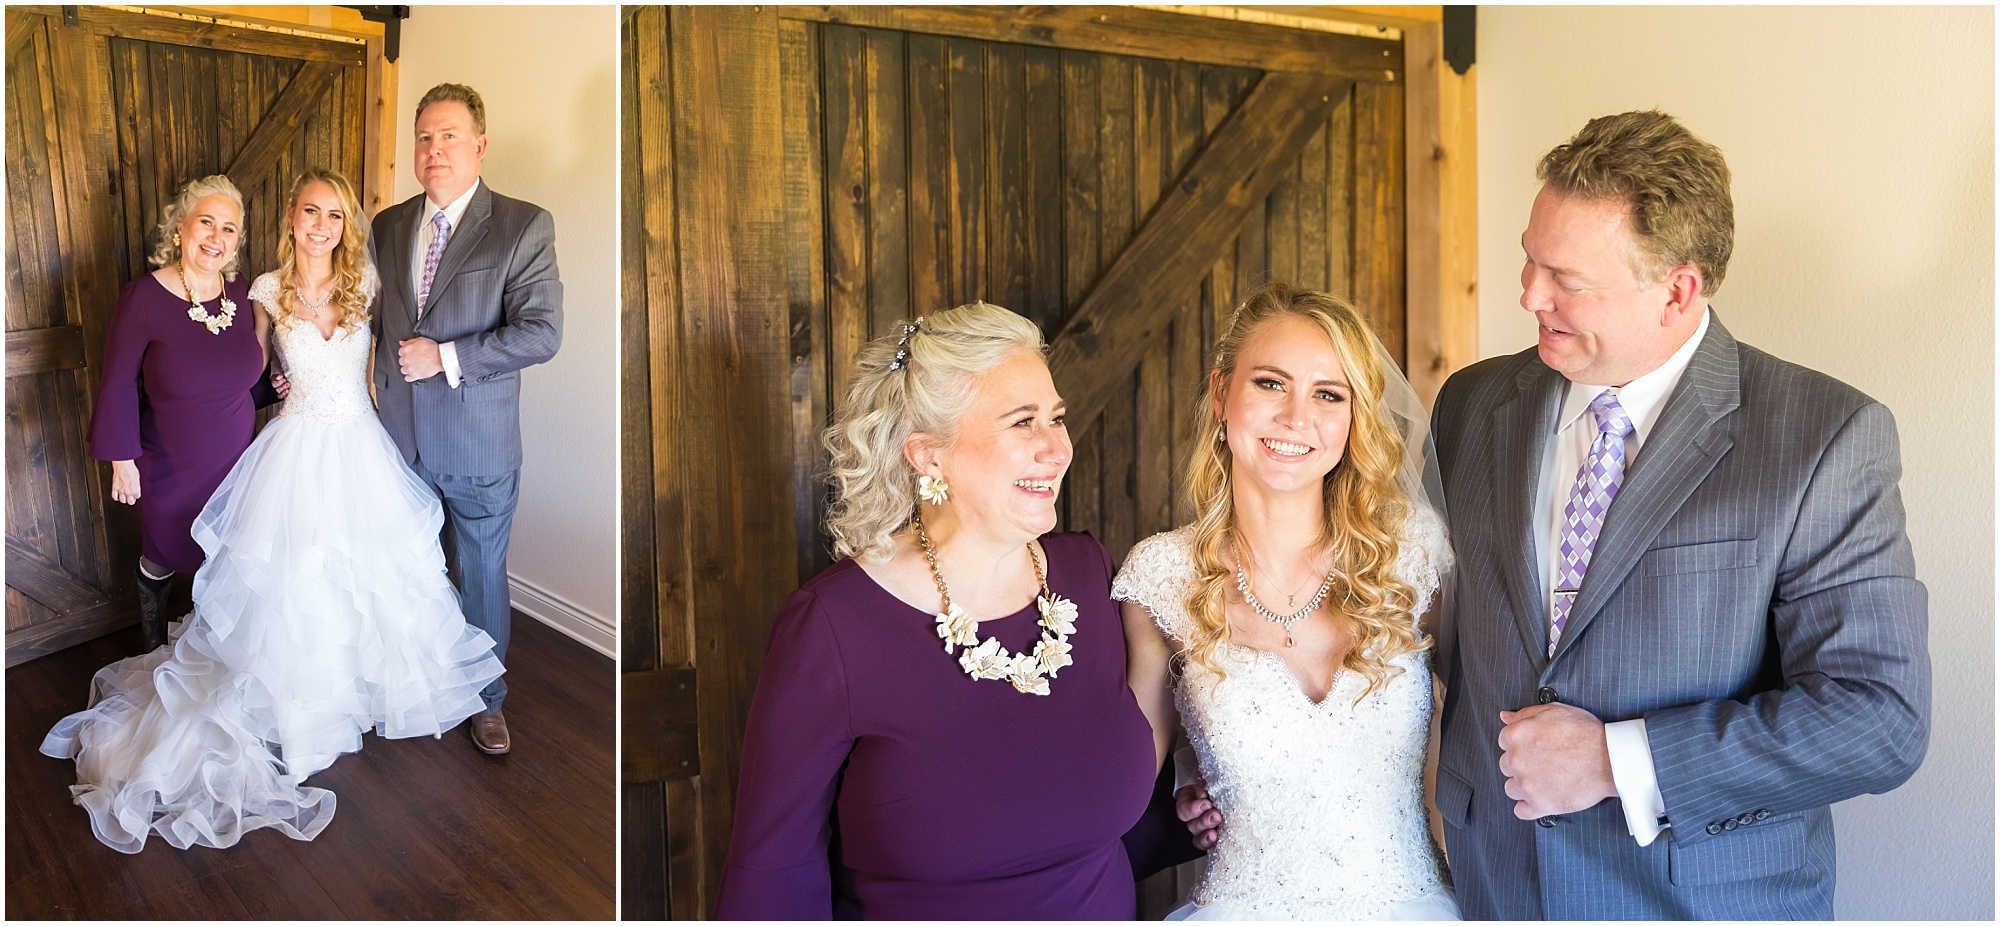 Disney-Inspired-Wedding-Central-Texas_0014.jpg